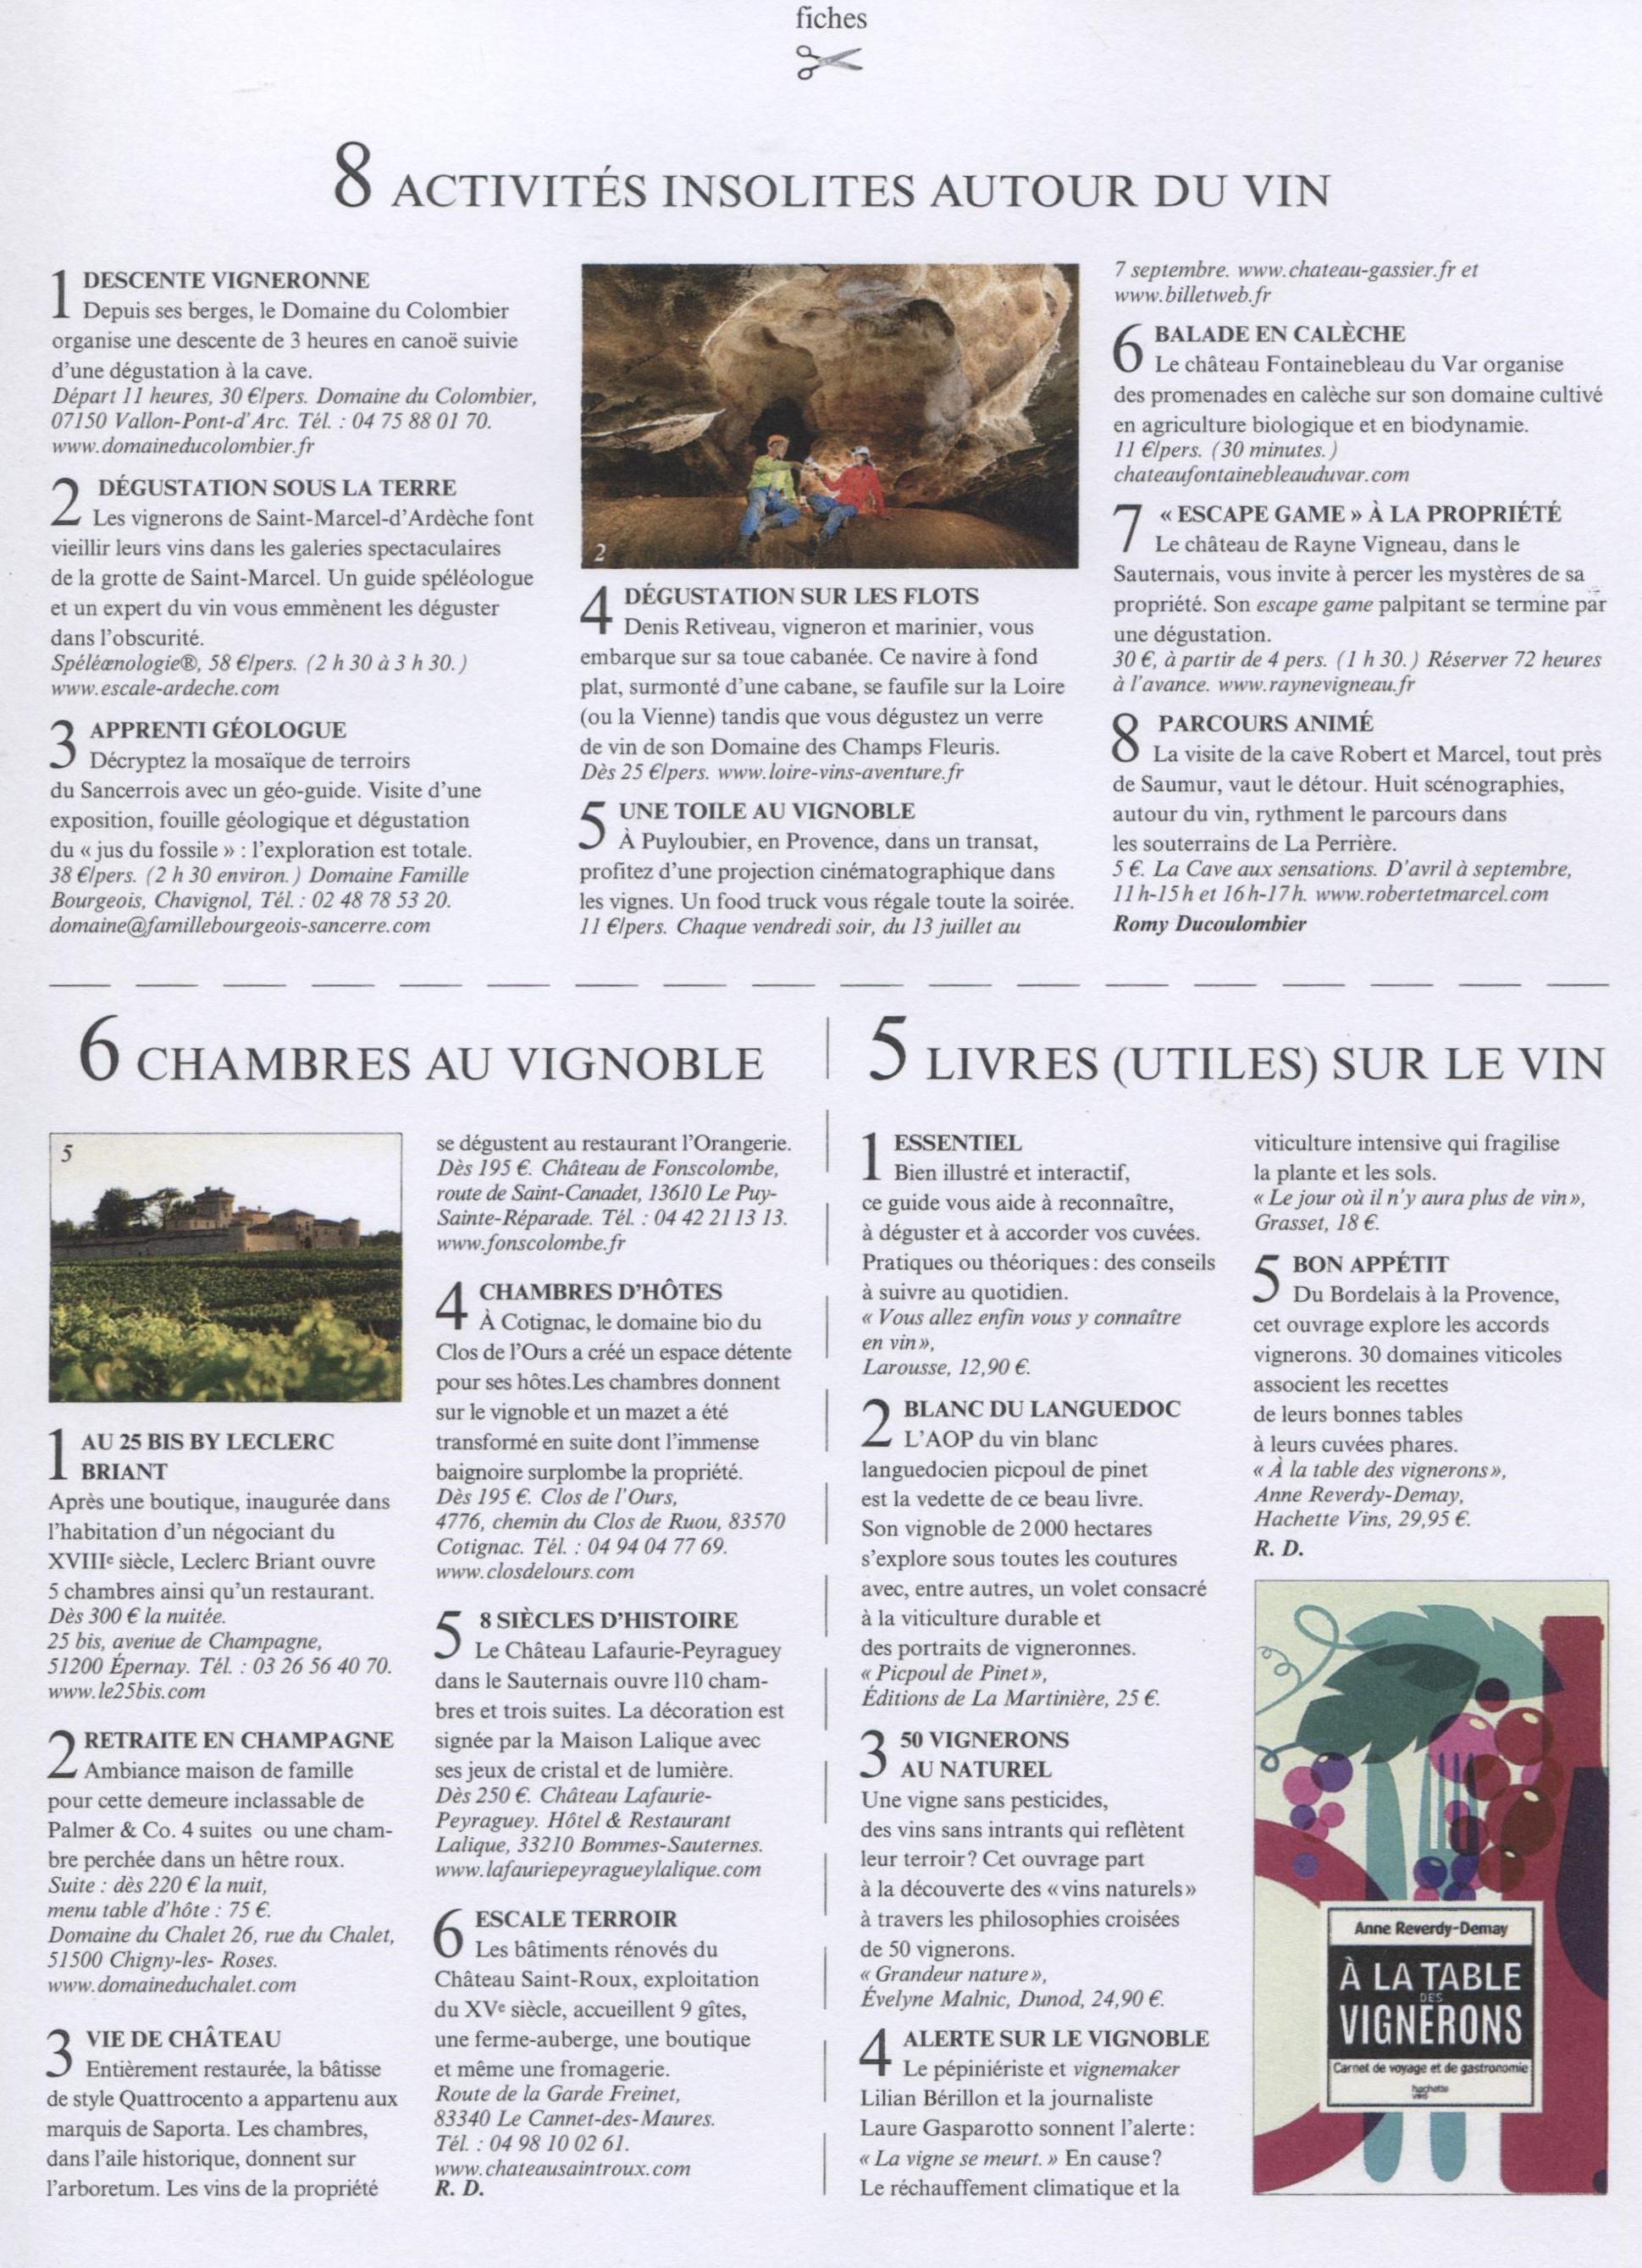 LE FIGARO JUILLET 2018 P1